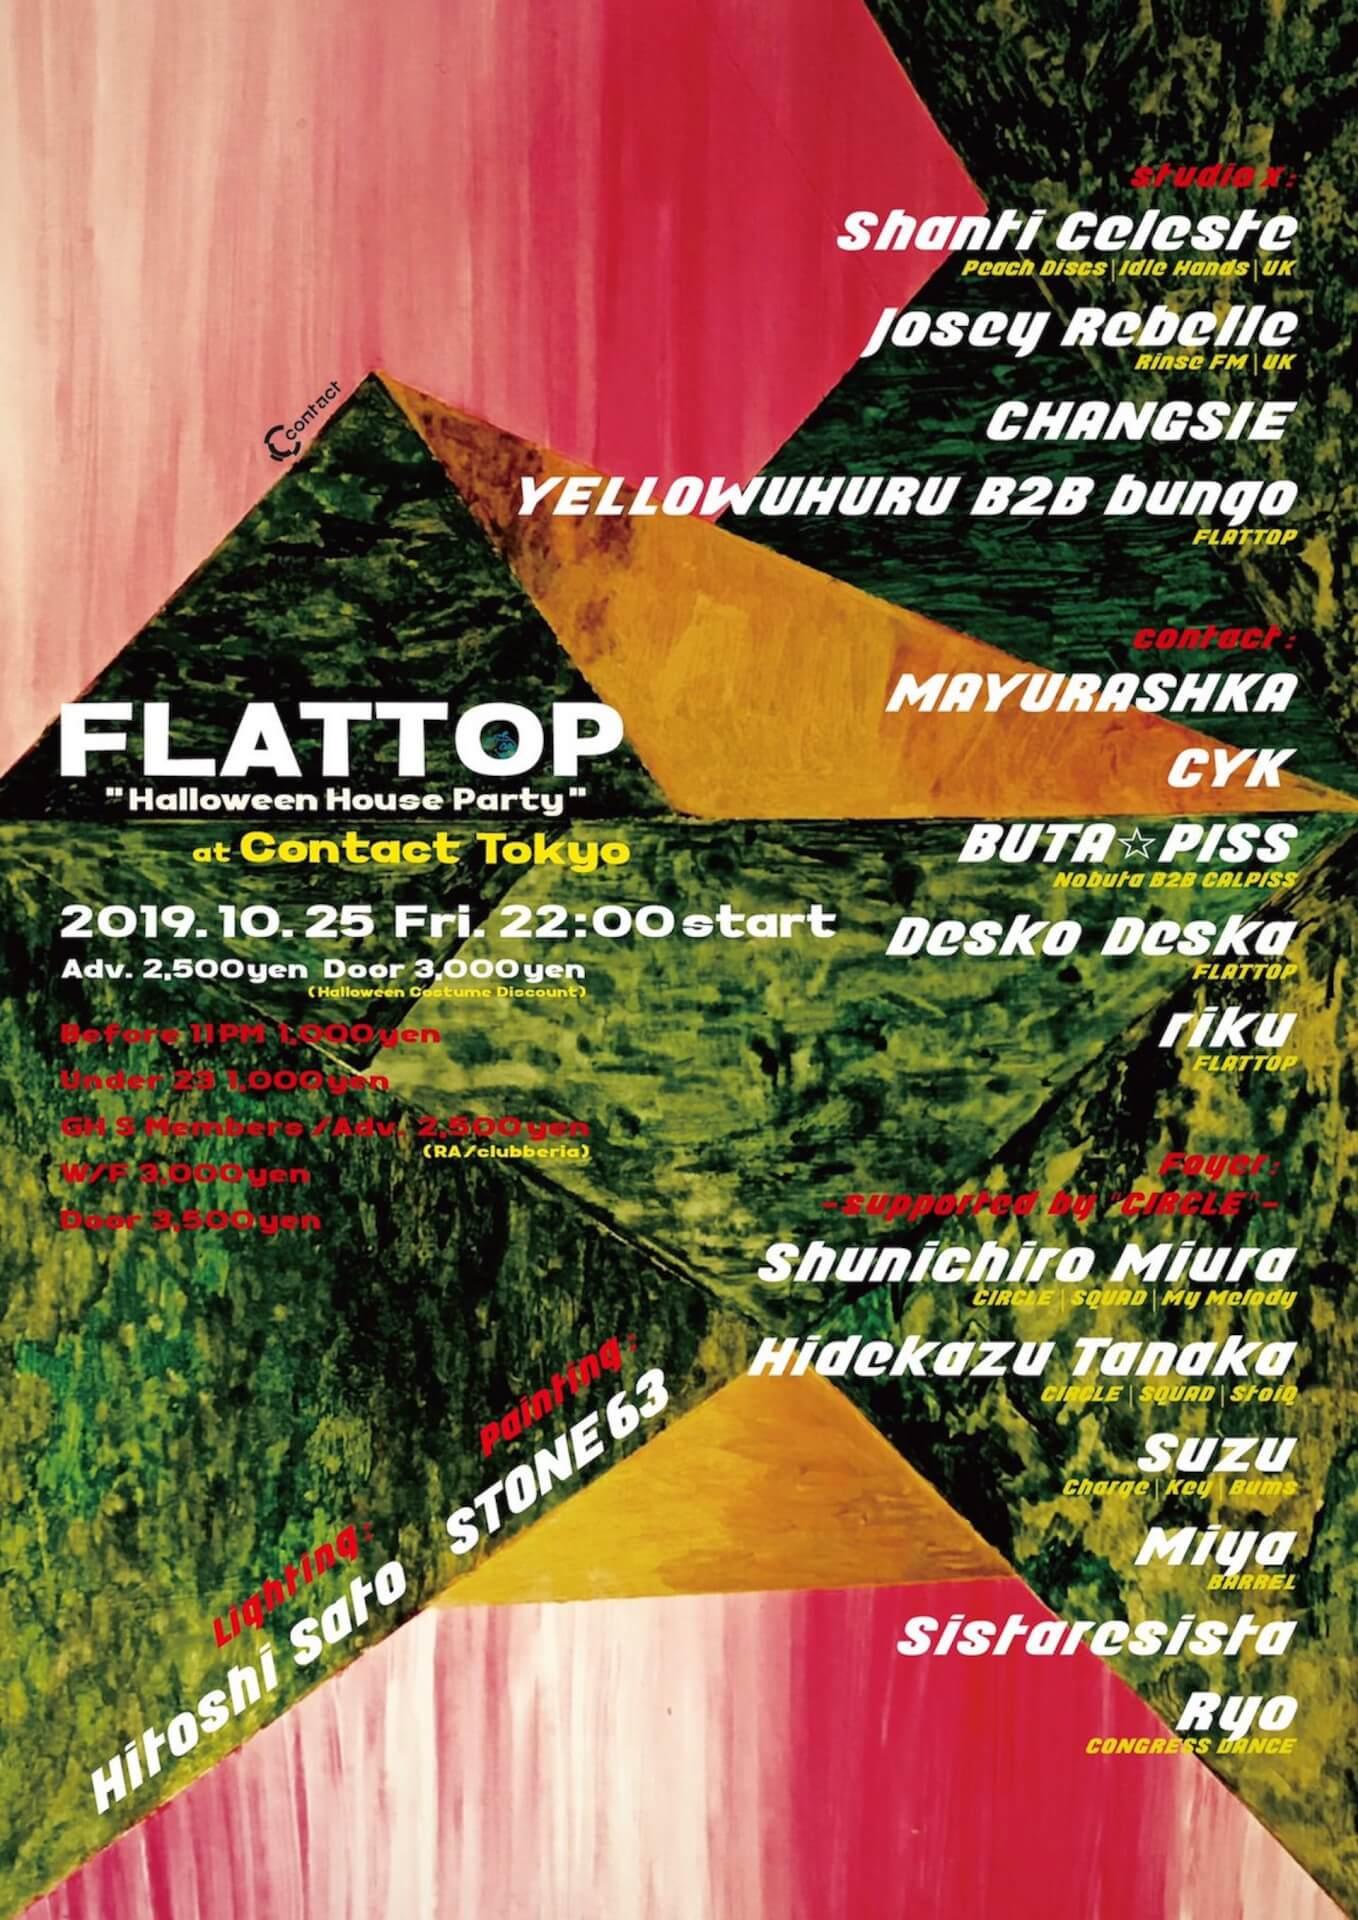 FLATTOPがハロウィン・ハウス・パーティーを開催 Shanti Celeste、Josey Rebelleを招聘、CHANGSIE、Mayurashka、CYKらが登場 music191024-flattop-1